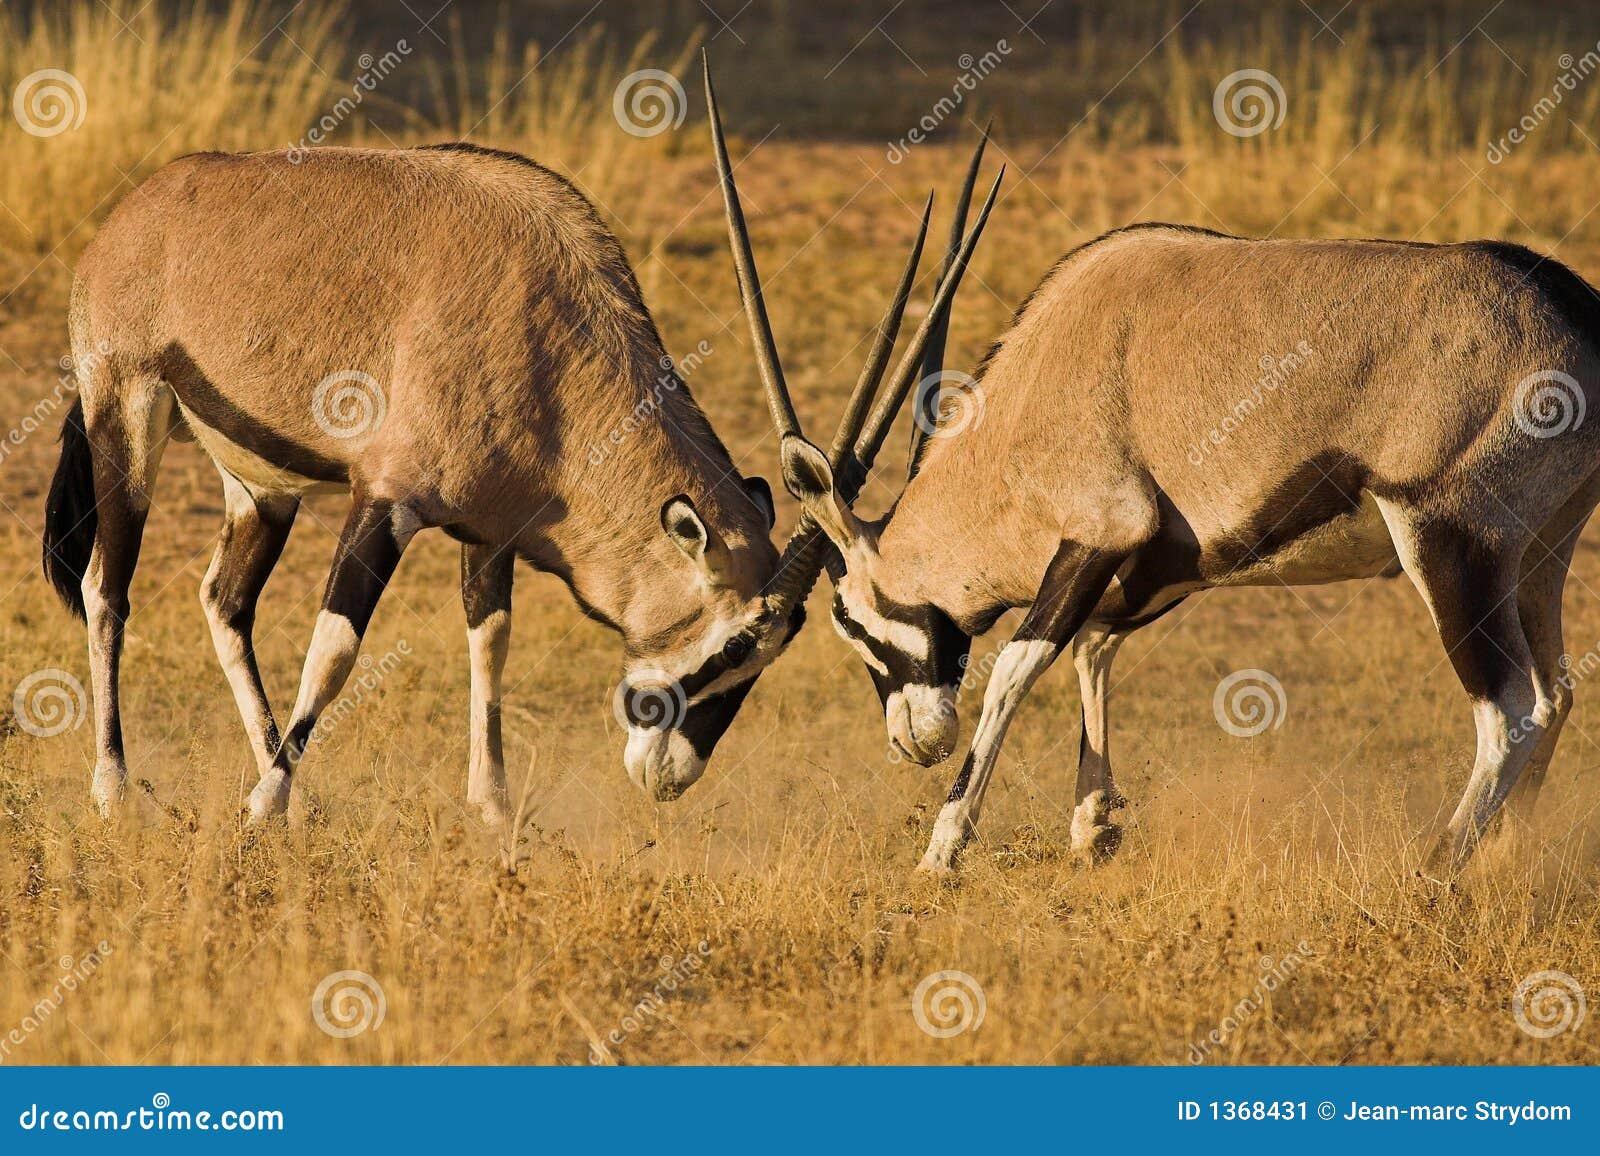 Gemsbok Fighting Stock Image - Image: 1368431